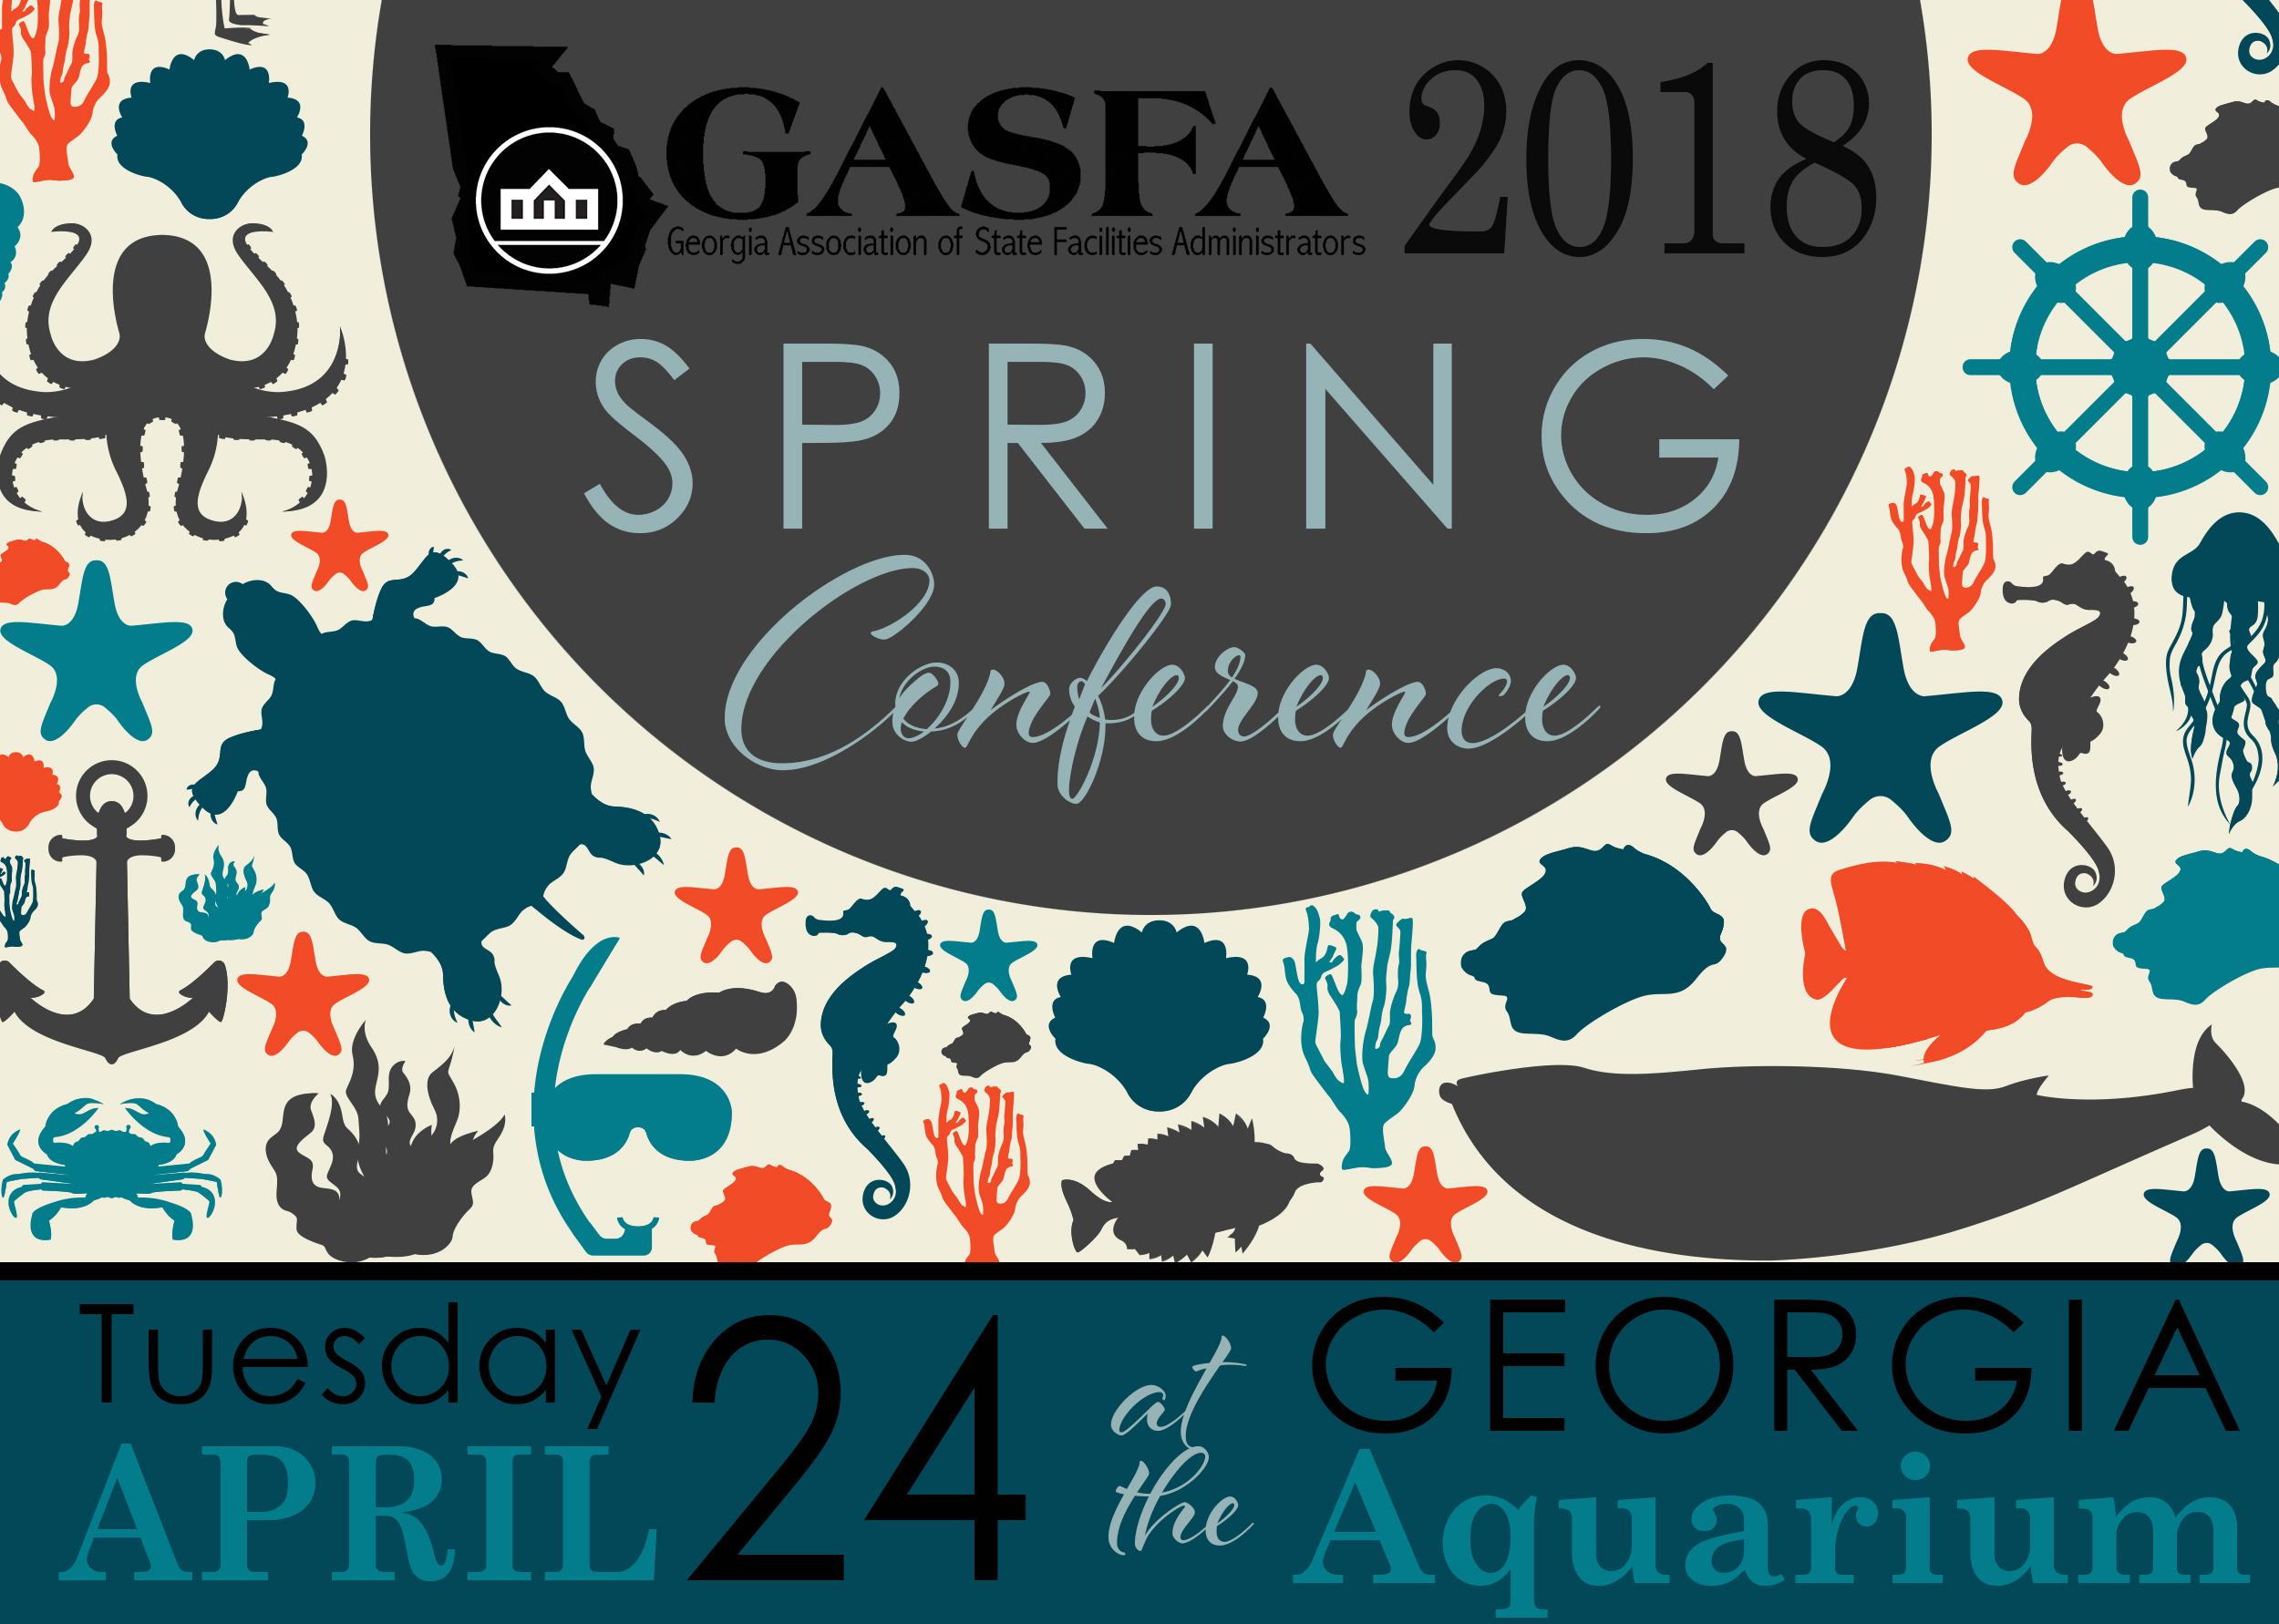 Spring2018 Conference2.jpg